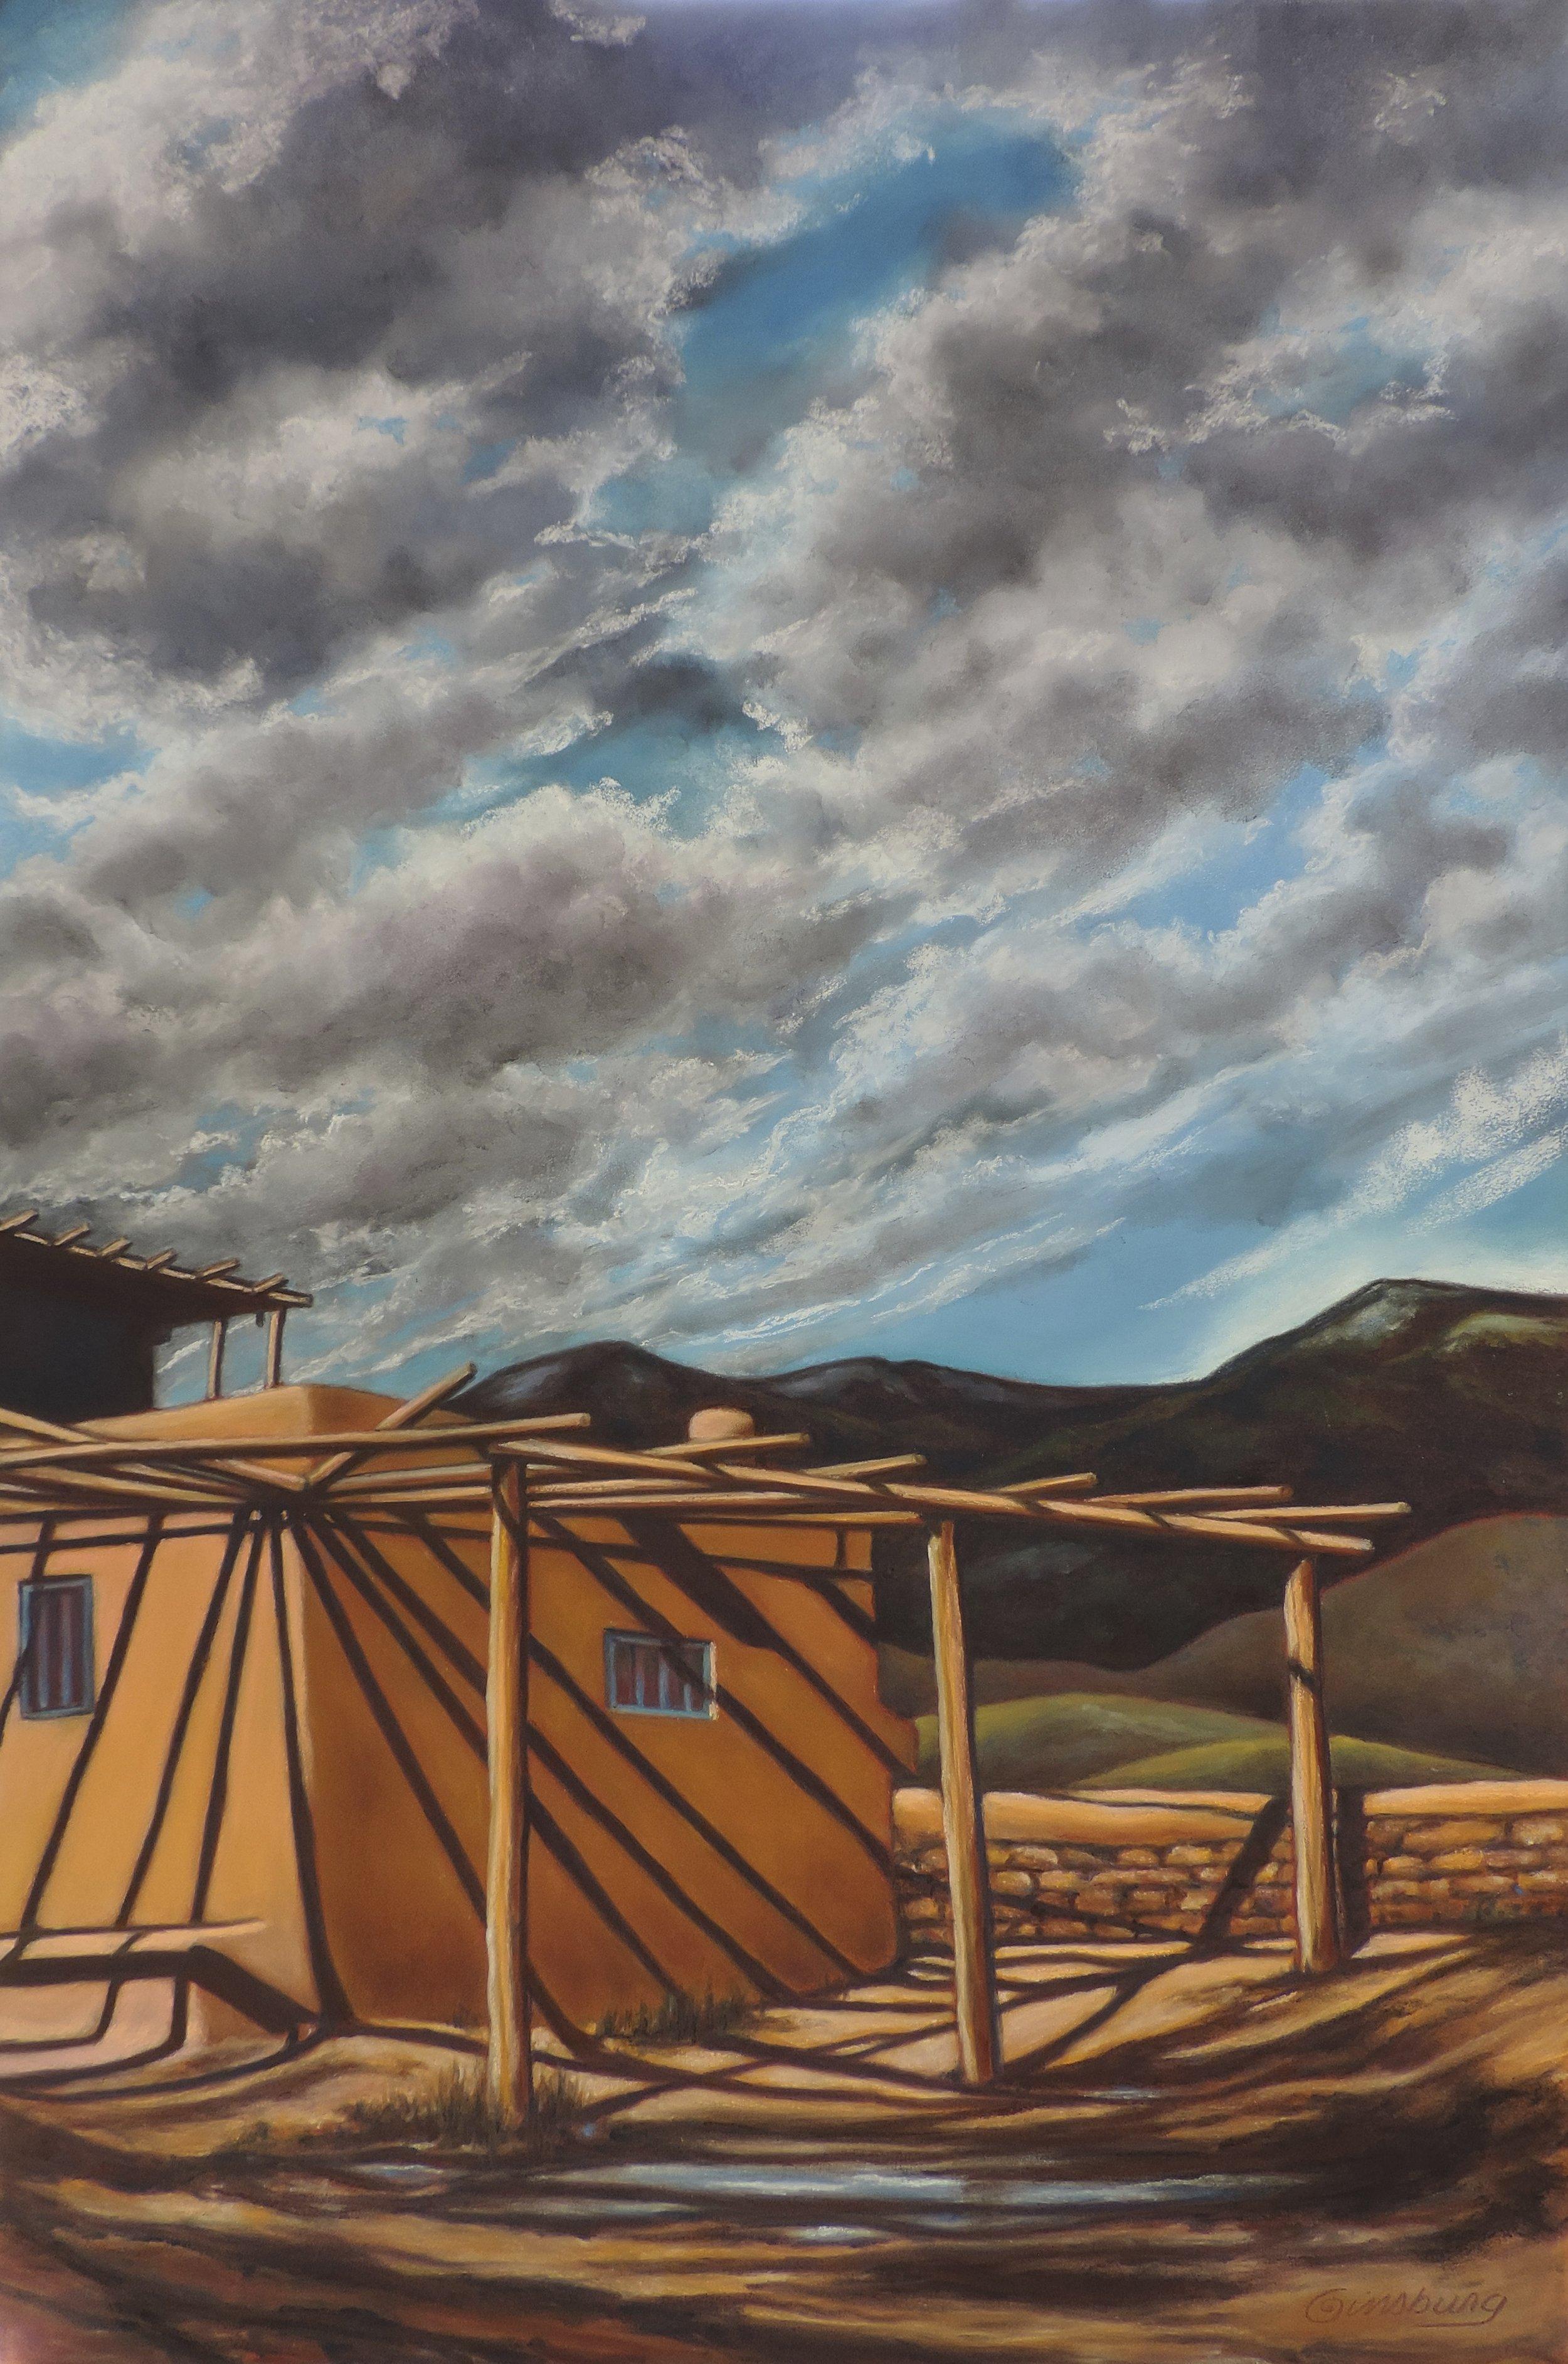 """TAOS PUEBLO HOME"", TAOS, NEW MEXICO  Pan Pastel® Cheri GInsburg ©"